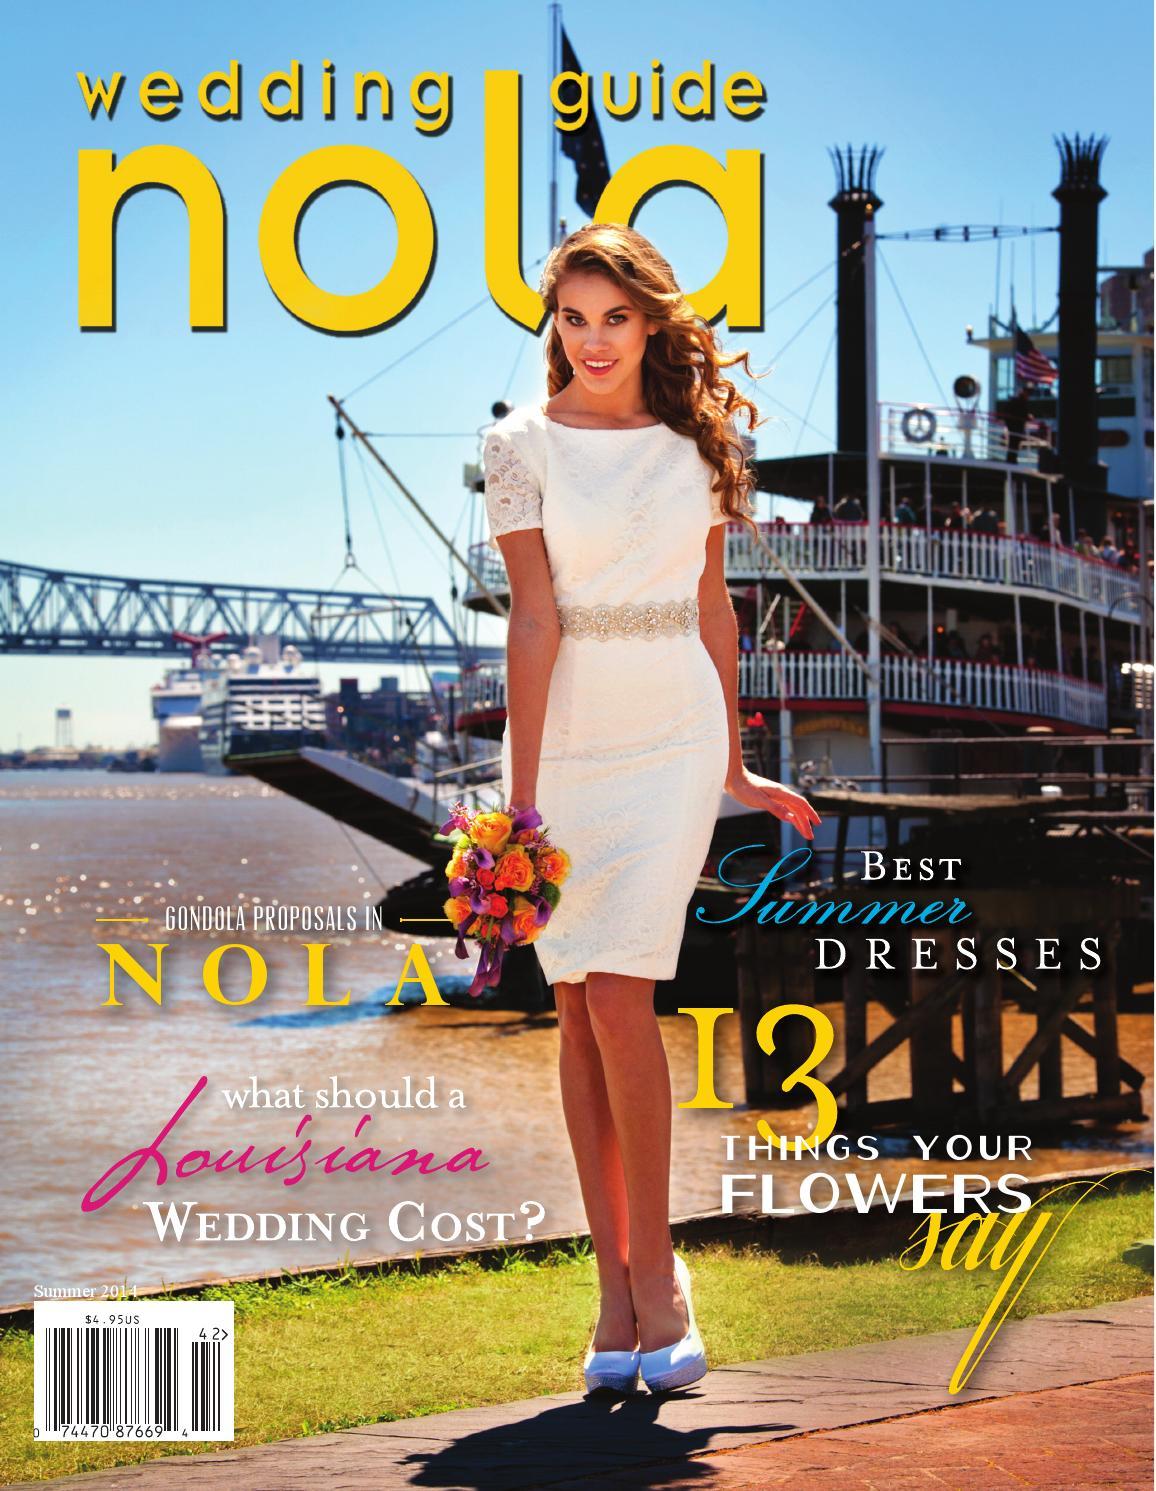 nola wedding guide winter by nola wedding guide issuu